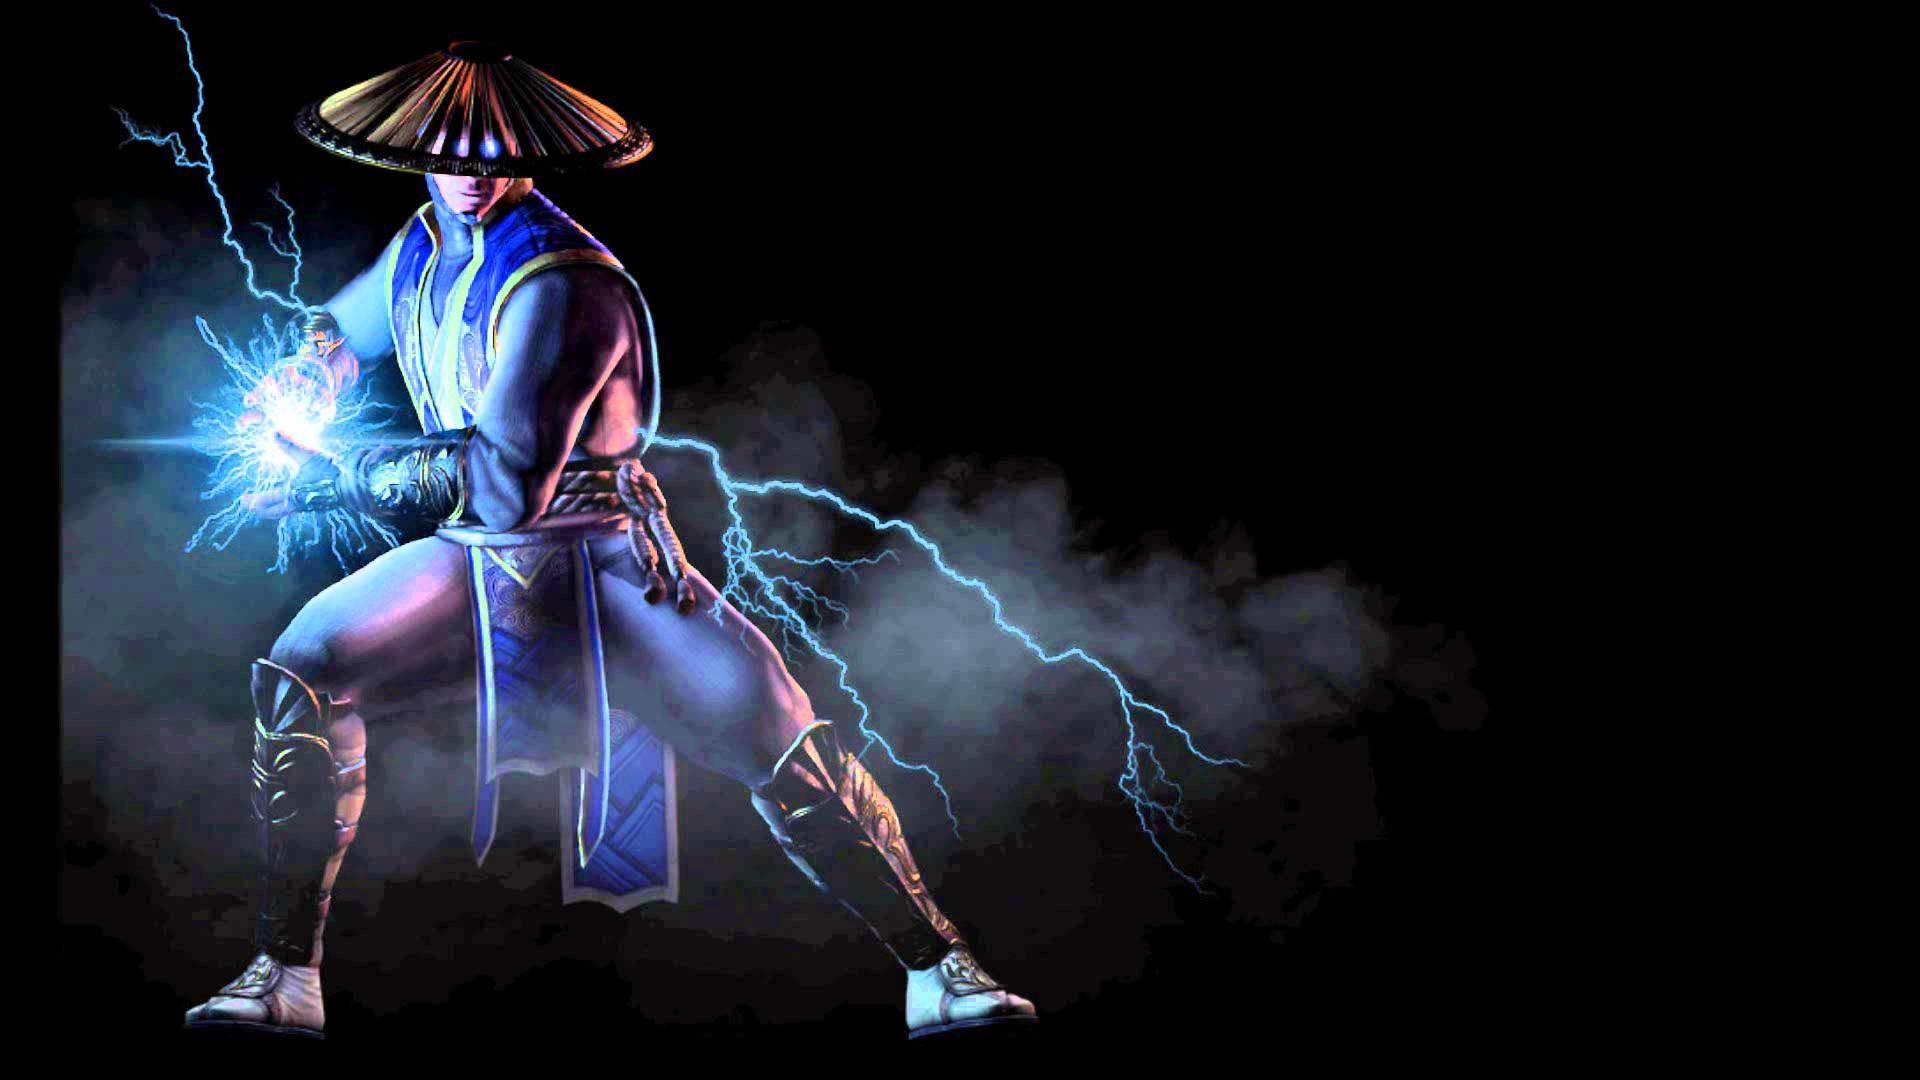 Raiden Mortal Kombat X wallpapers (61 Wallpapers)